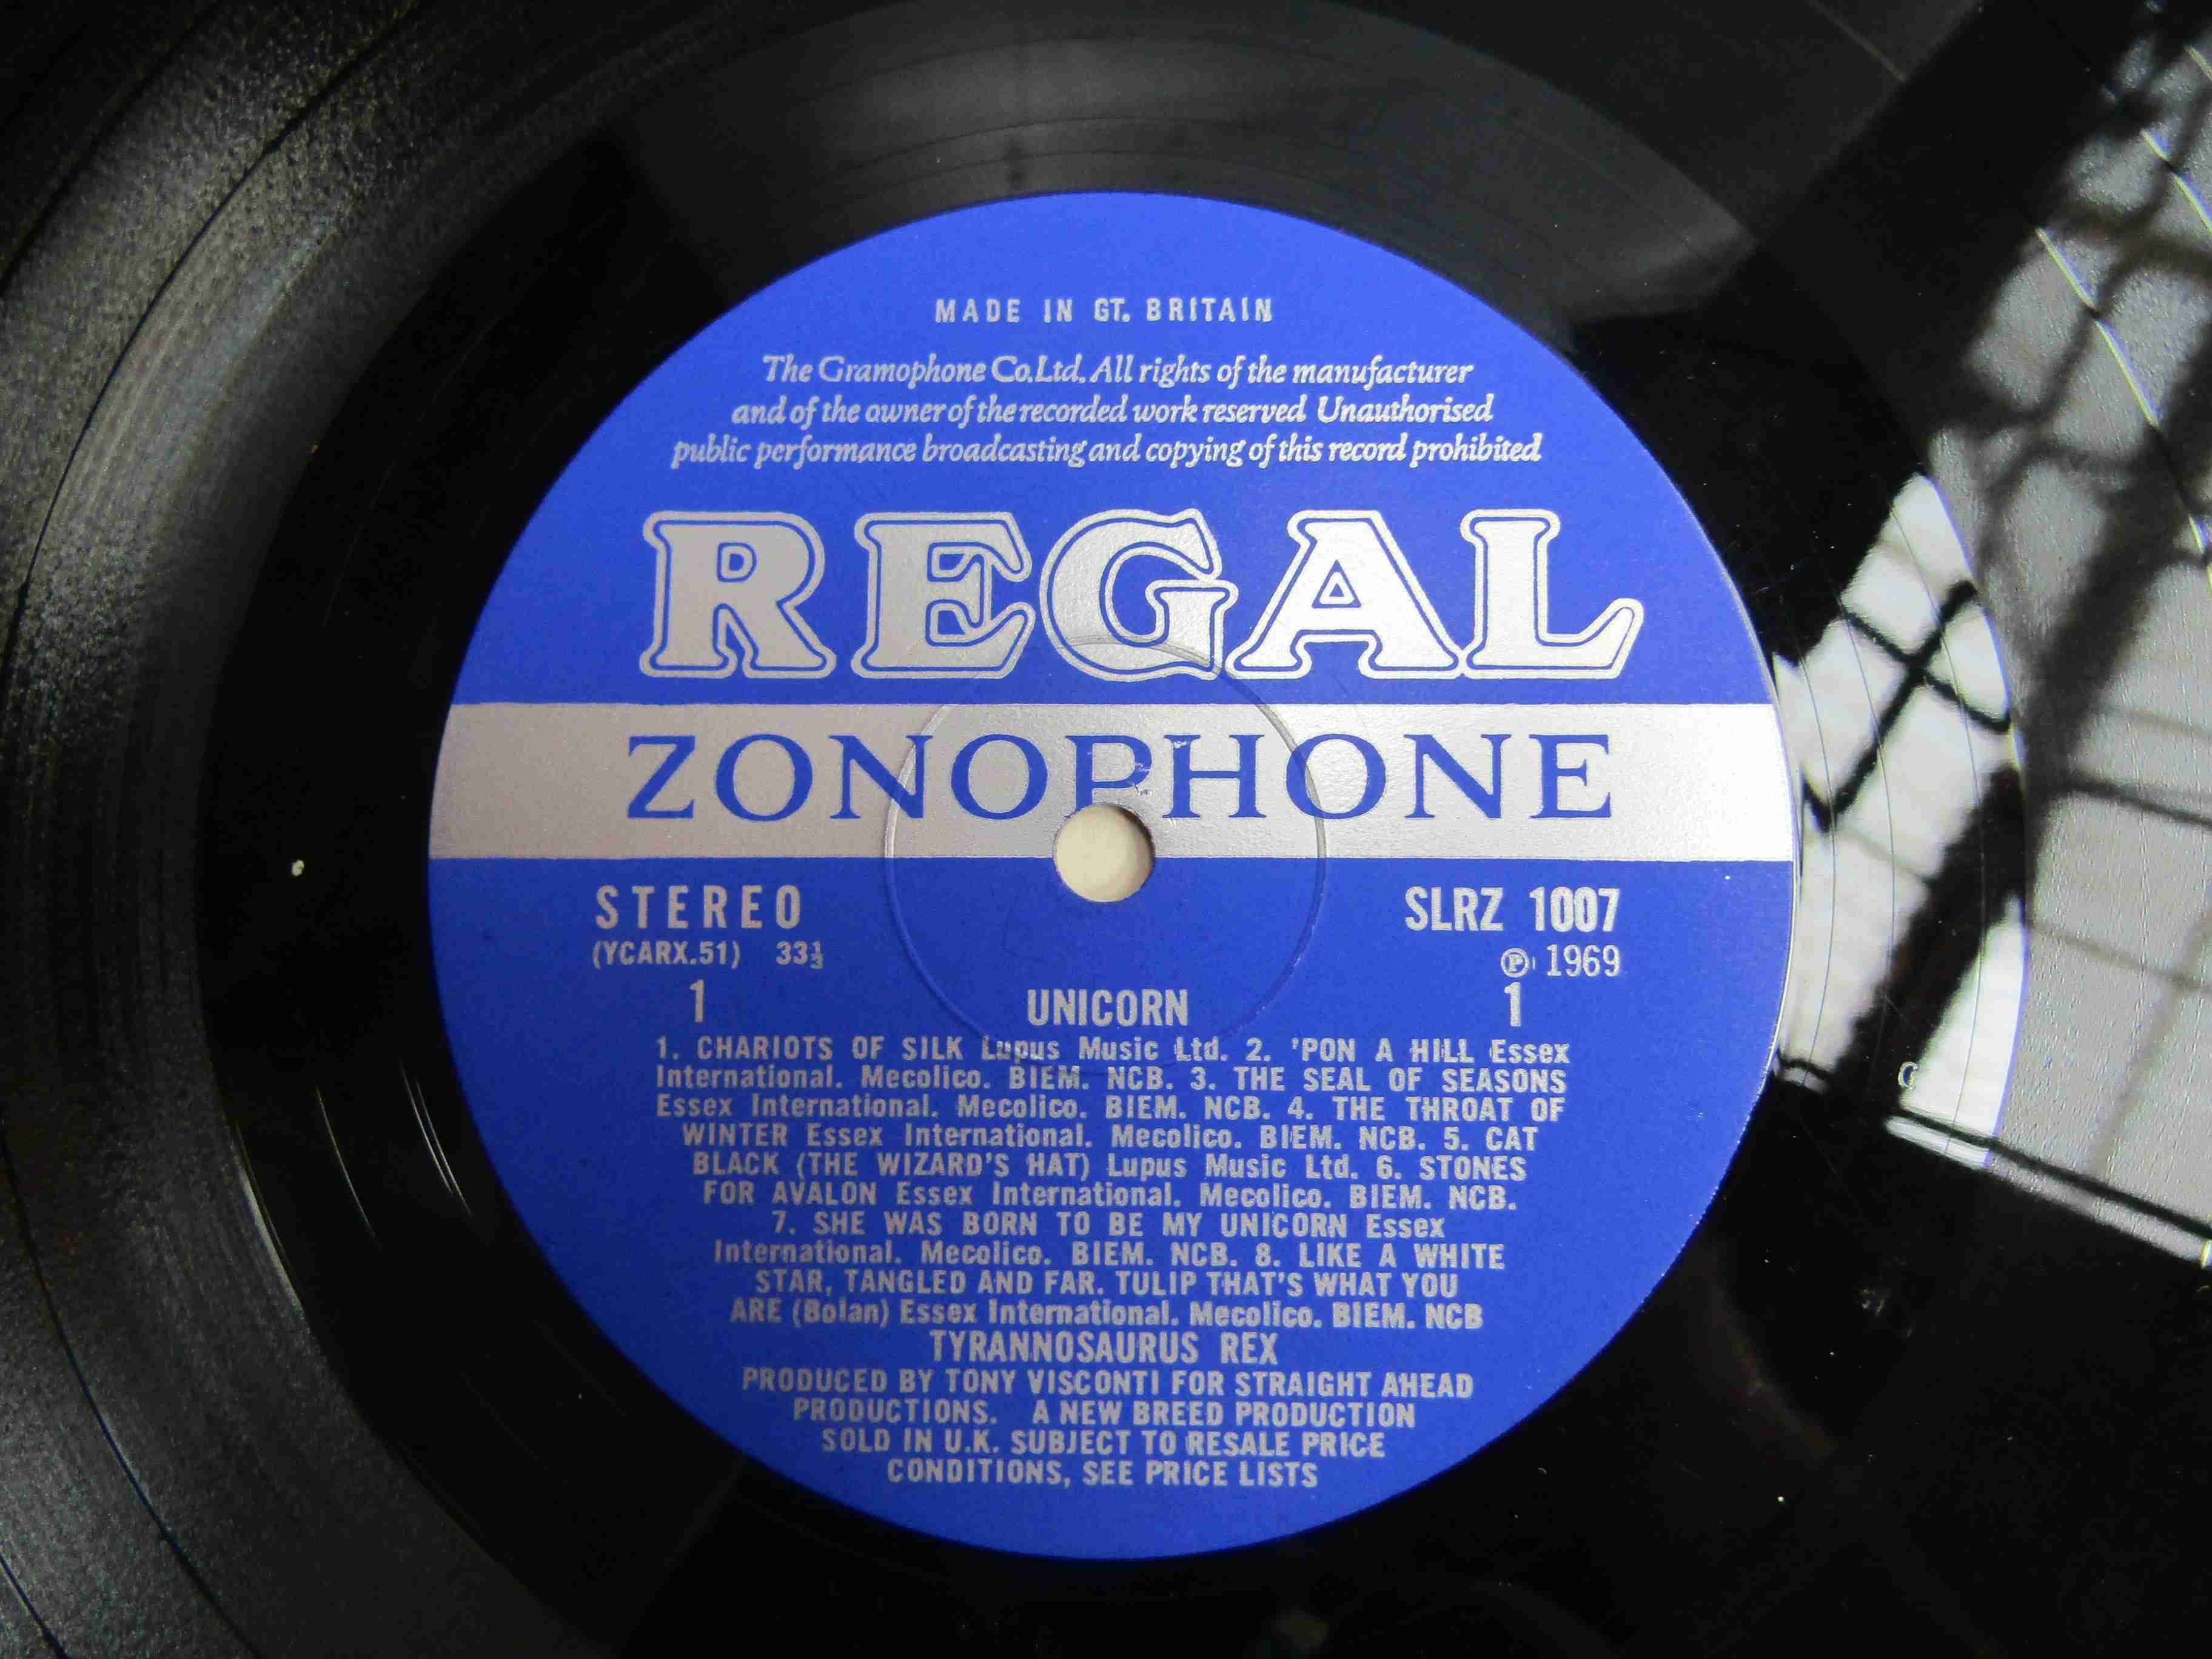 TYRANNOSAURUS REX: 'Unicorn' LP, Regal Zonophone SLRZ 1007, blue labels (media VG+, - Image 2 of 3